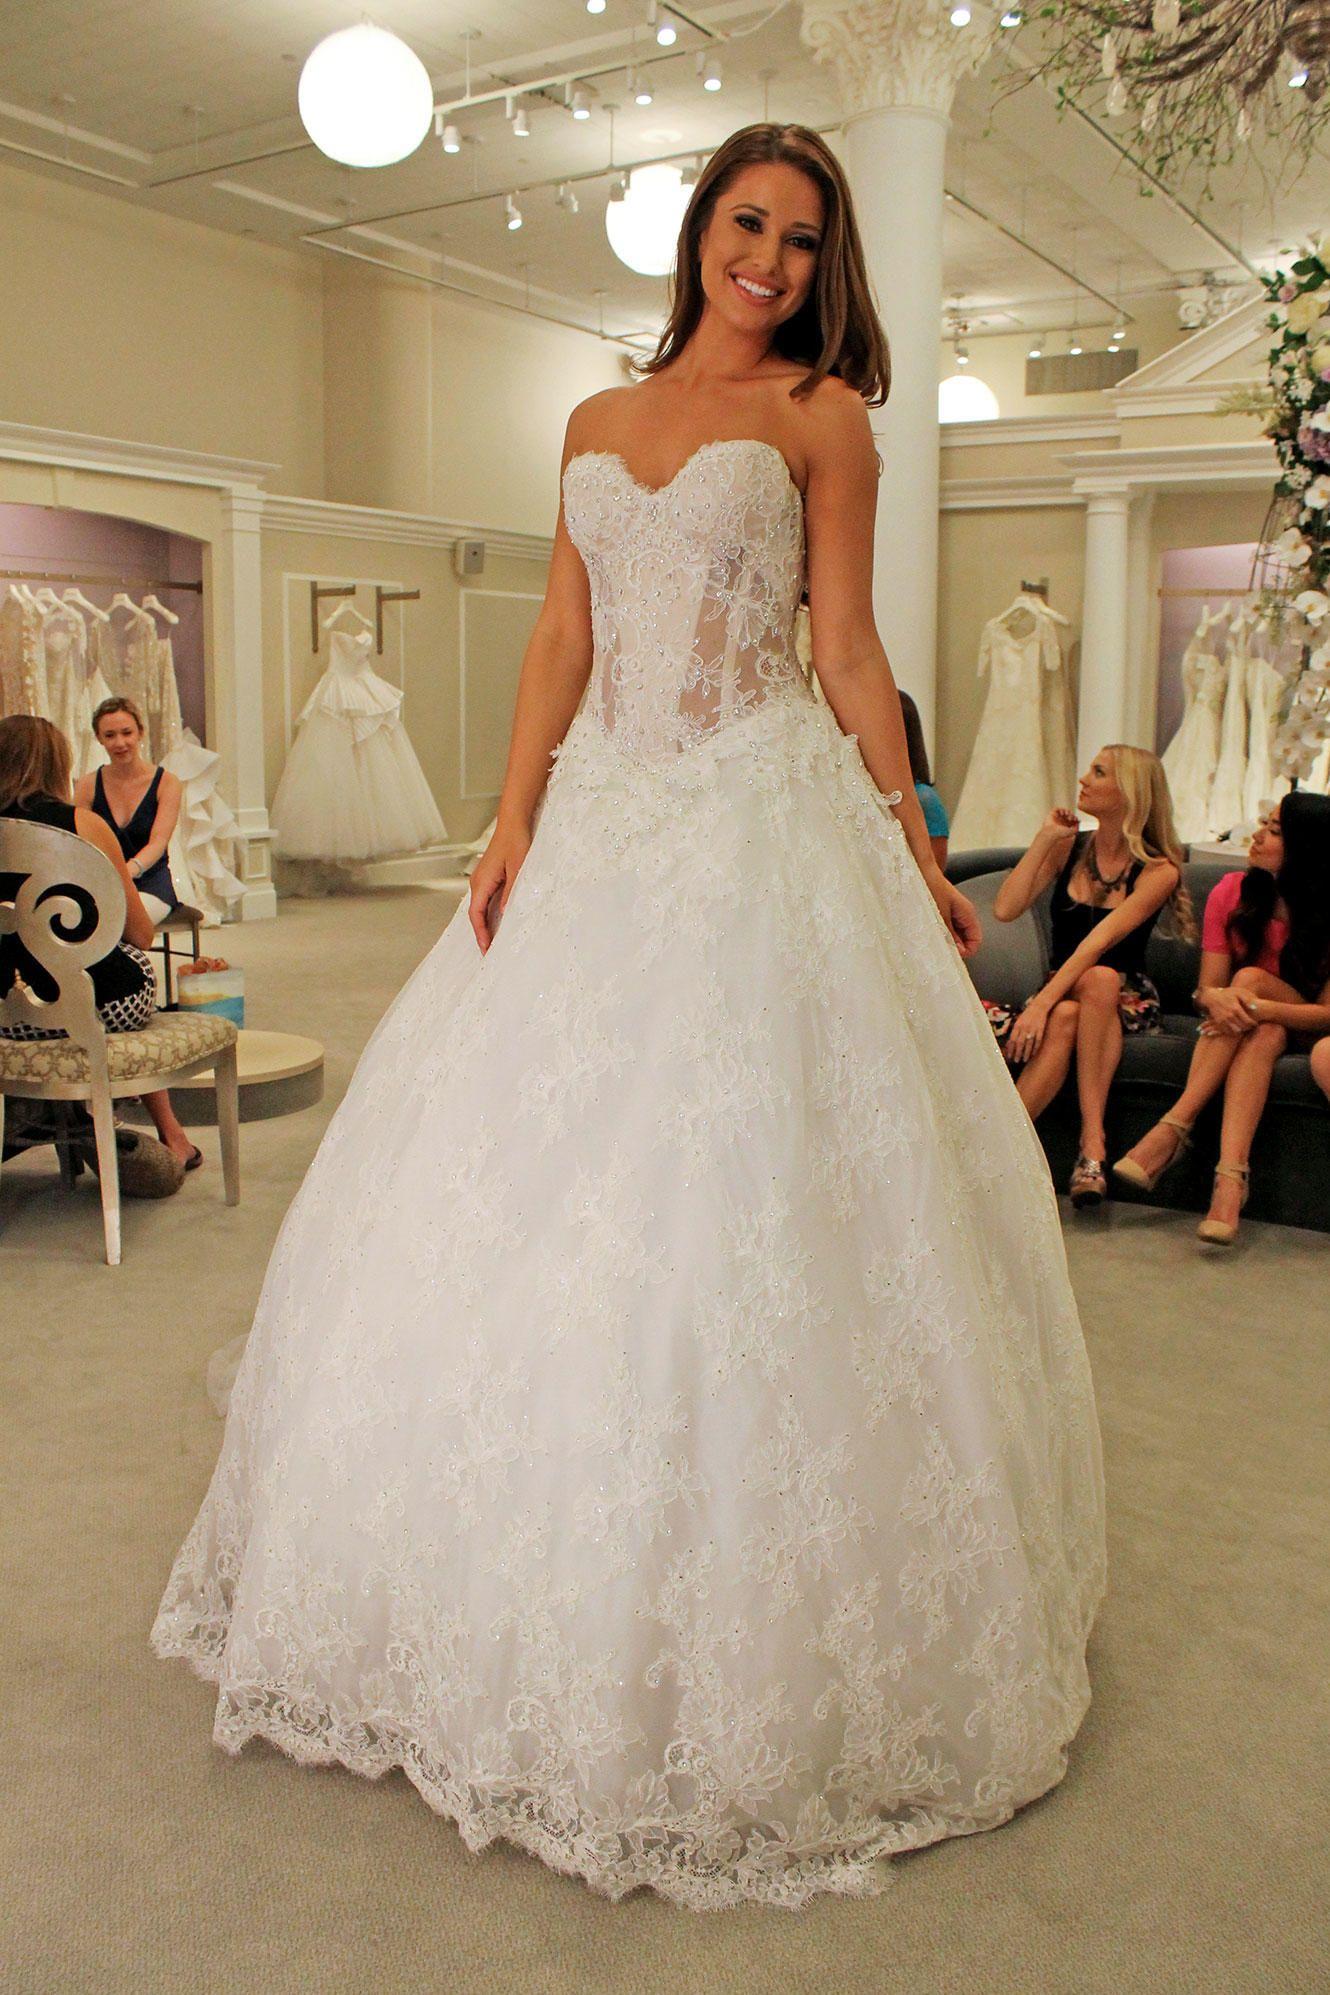 Season 14 Featured Dress Pnina Tornai Hoop Skirt Drop Waist See Through Corset 15500: See Through Country Wedding Dresses At Reisefeber.org